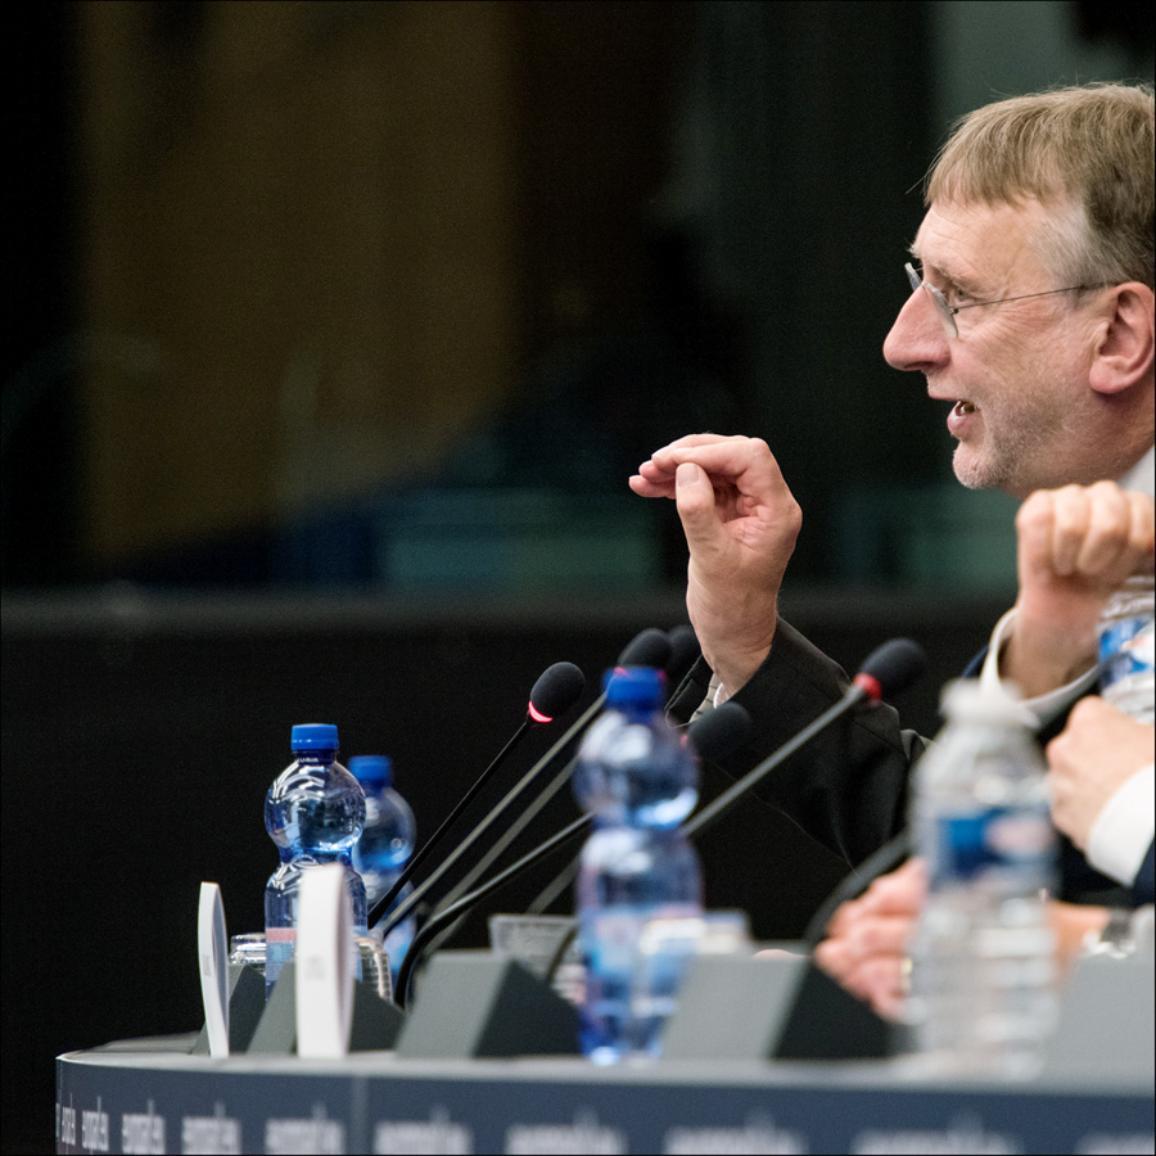 Press conference of Bernd Lange on the EU-US trade deal